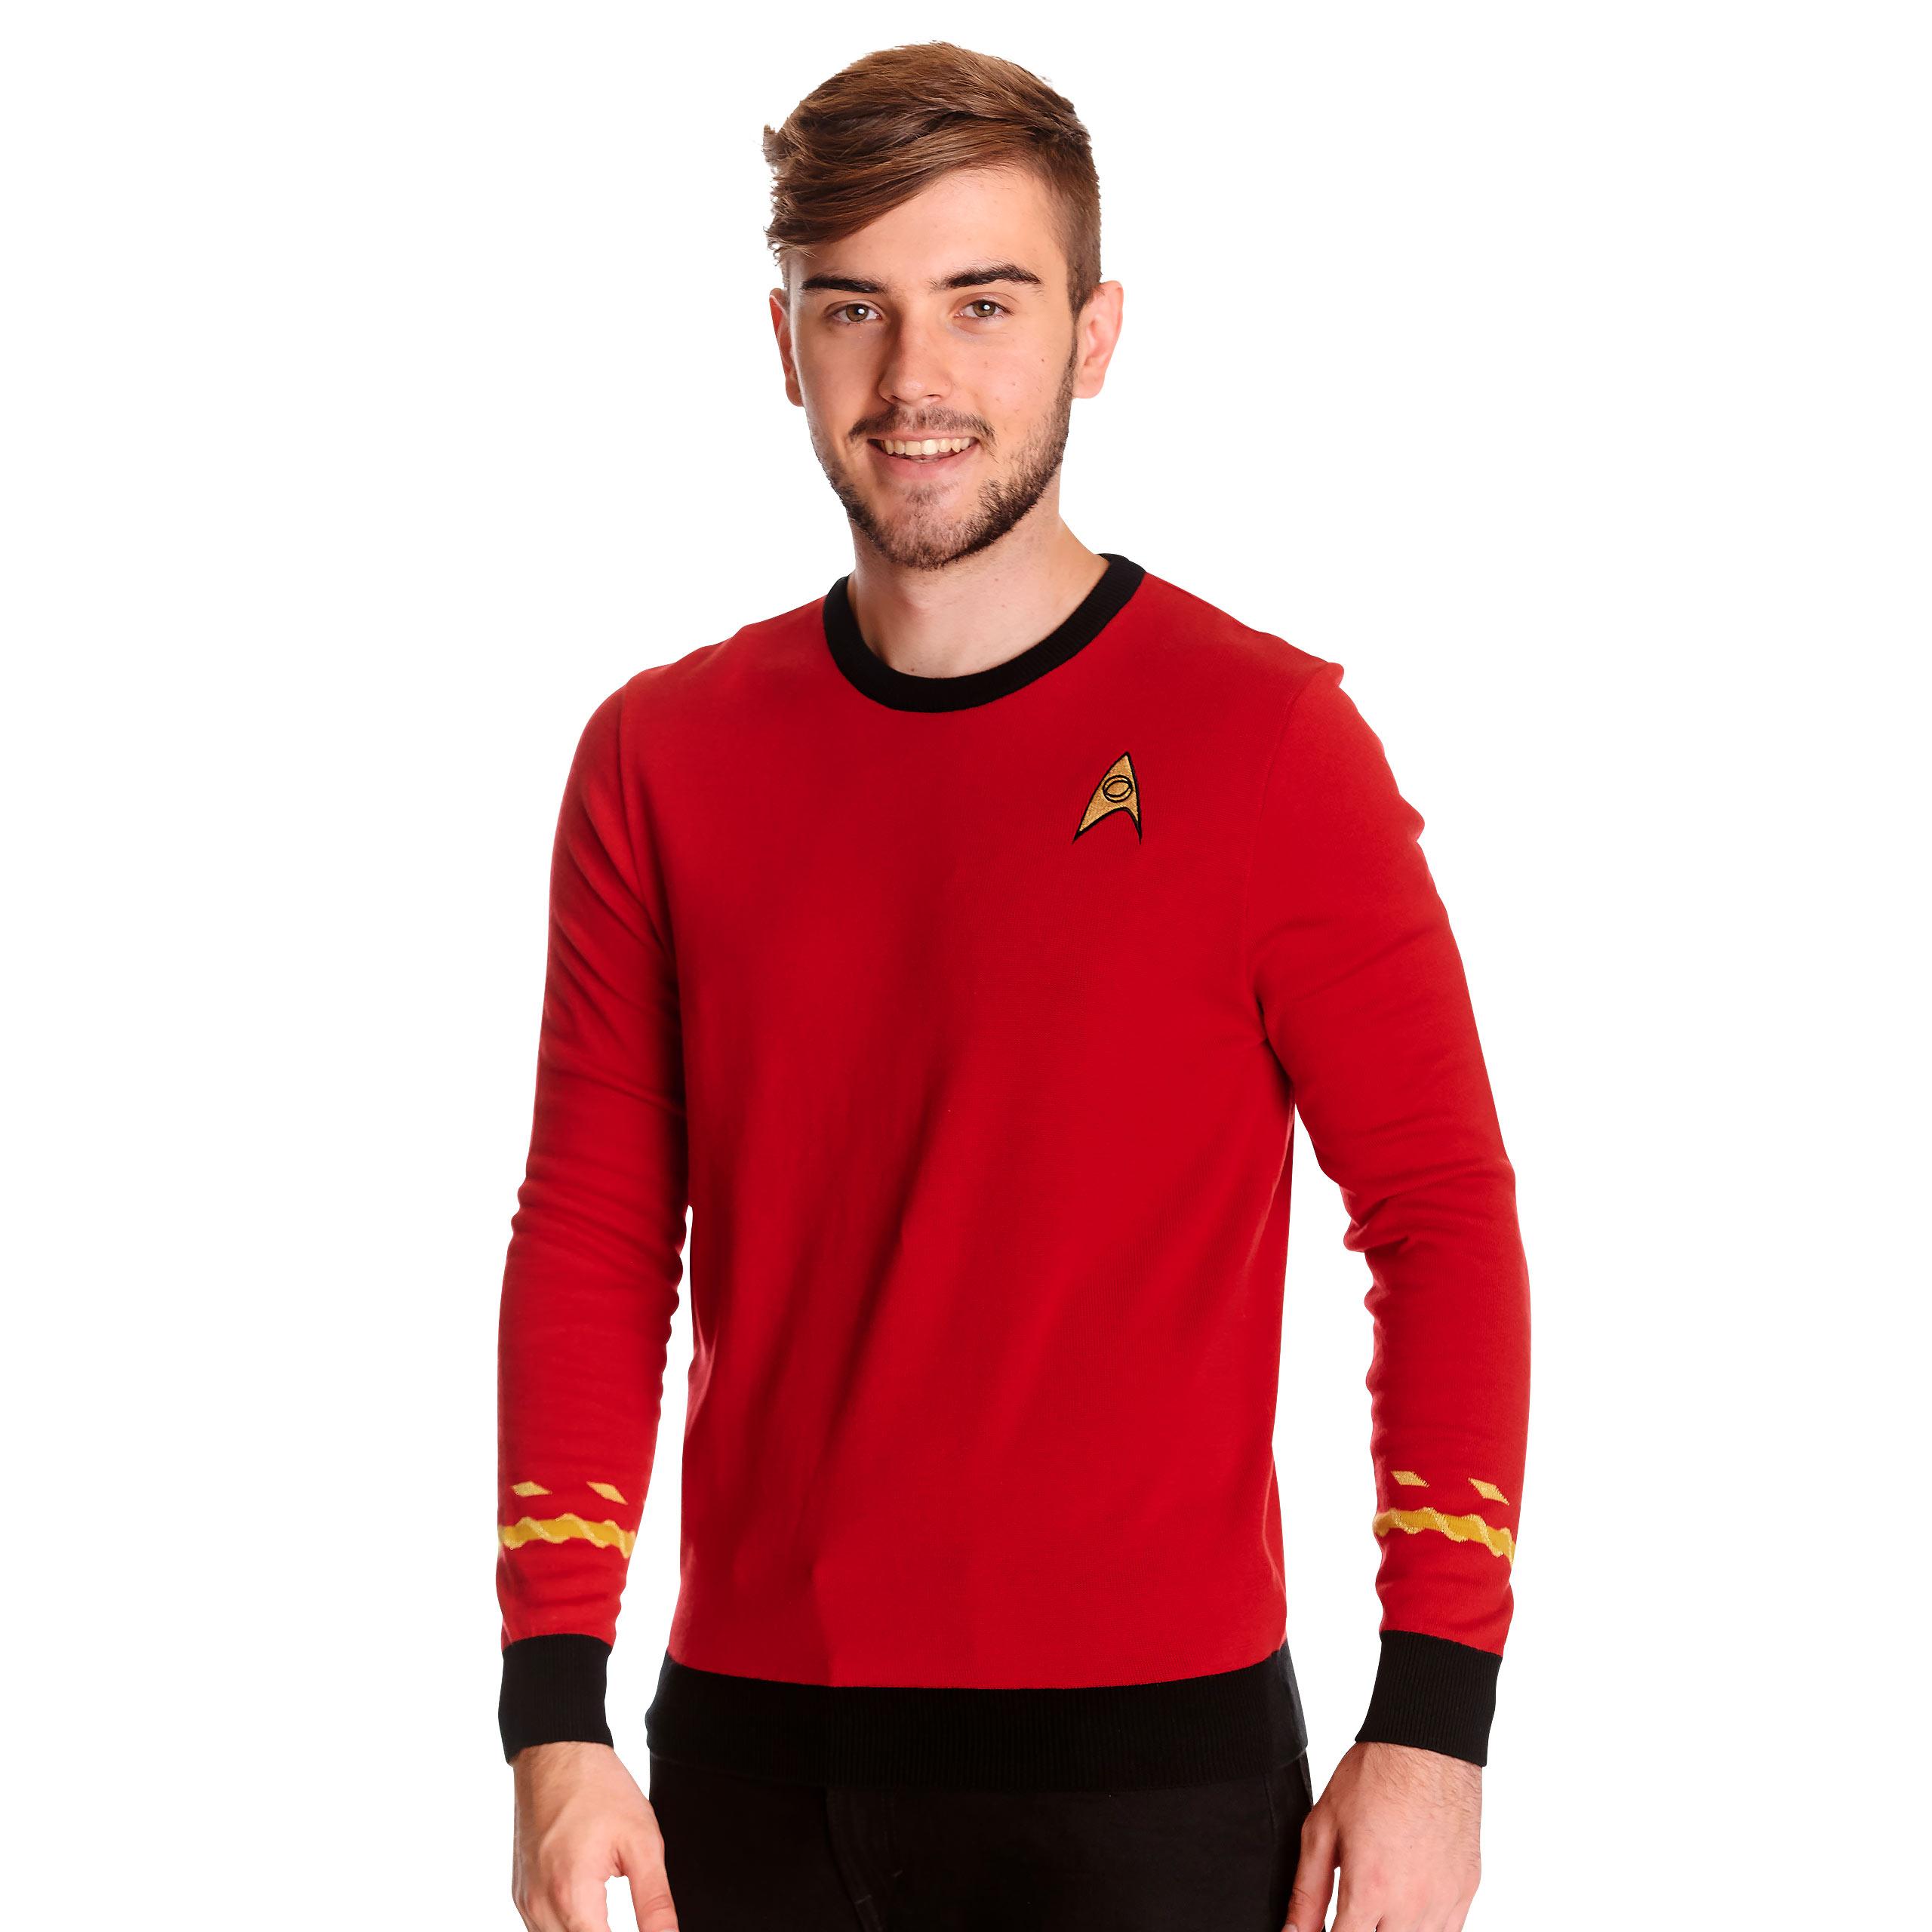 Star Trek - Scotty Uniform Strickpullover rot